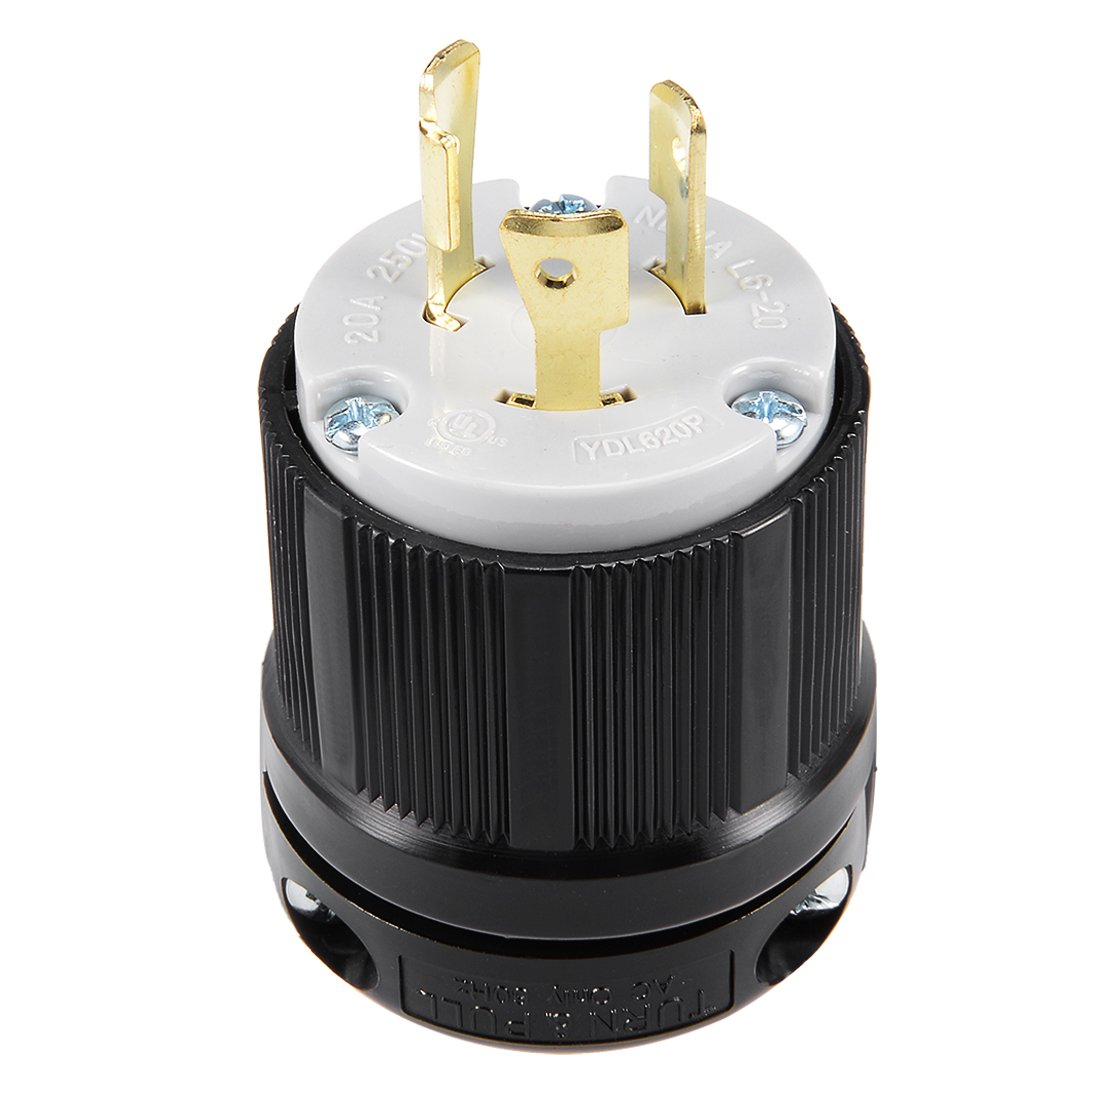 uxcell AC 125V 15A Nema 5-15P Straight 3-Pin Non-locking Plug Connector